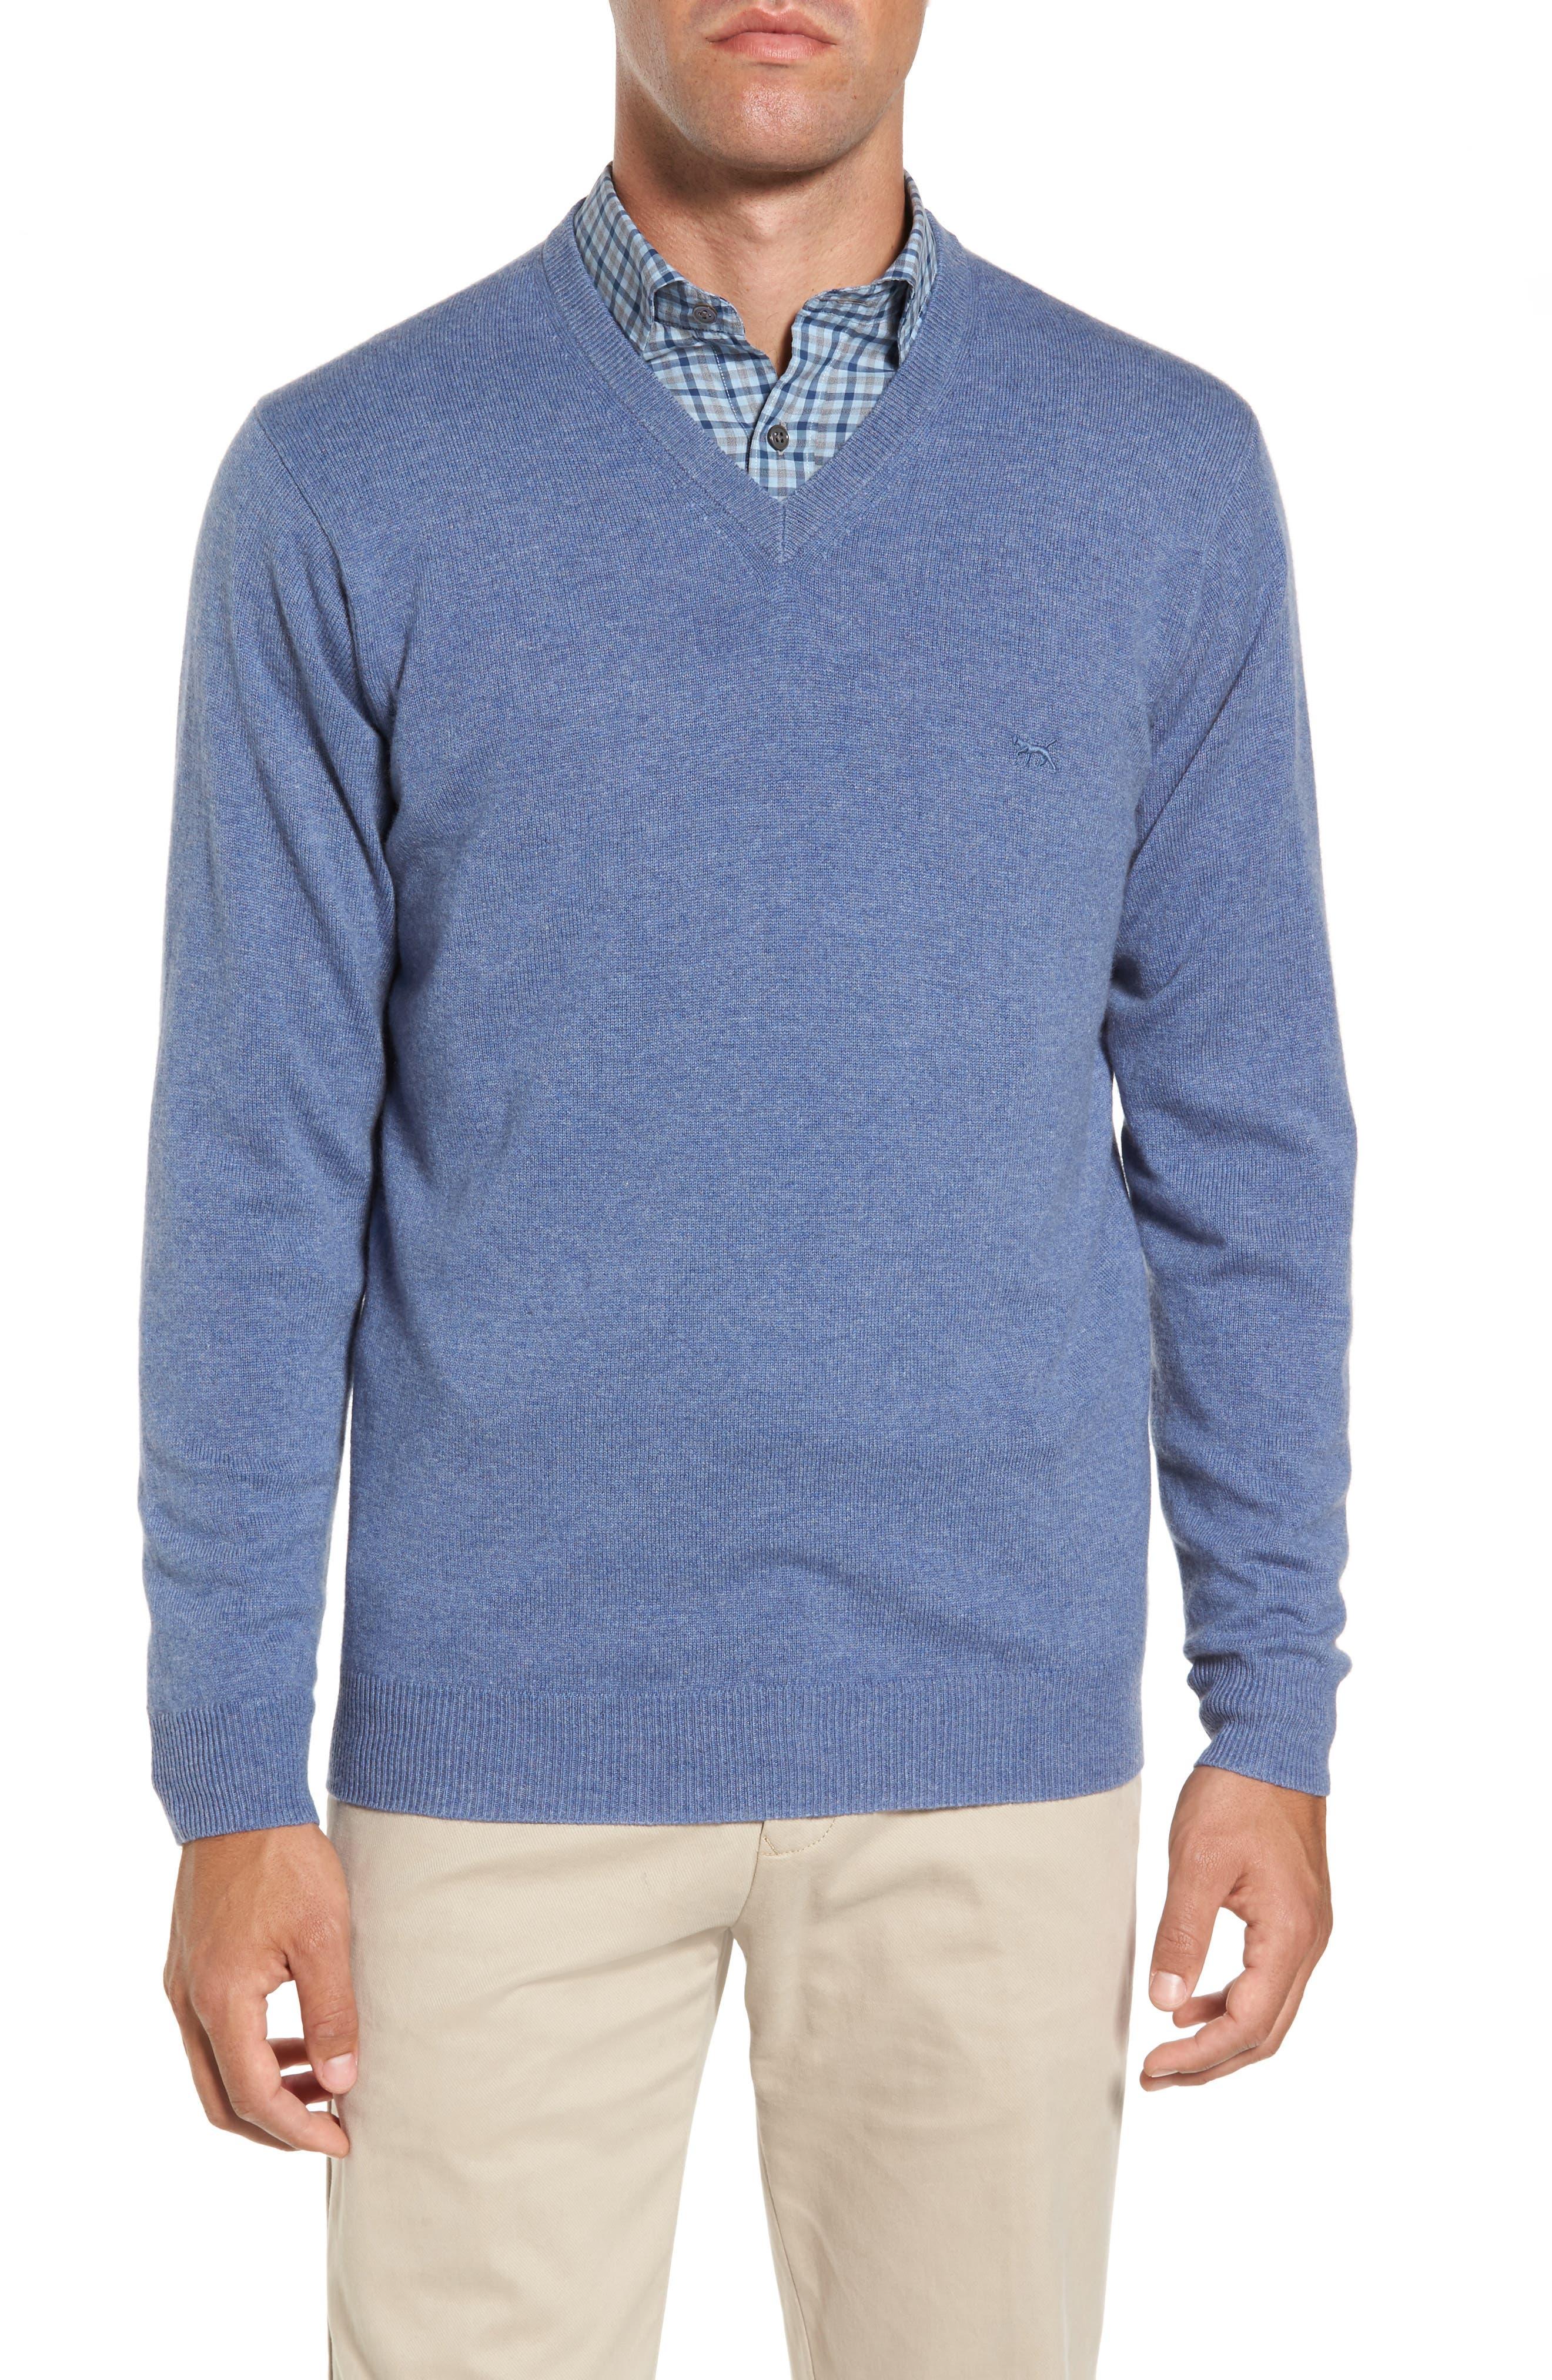 Rodd & Gunn 'Inchbonnie' Wool & Cashmere V-Neck Sweater